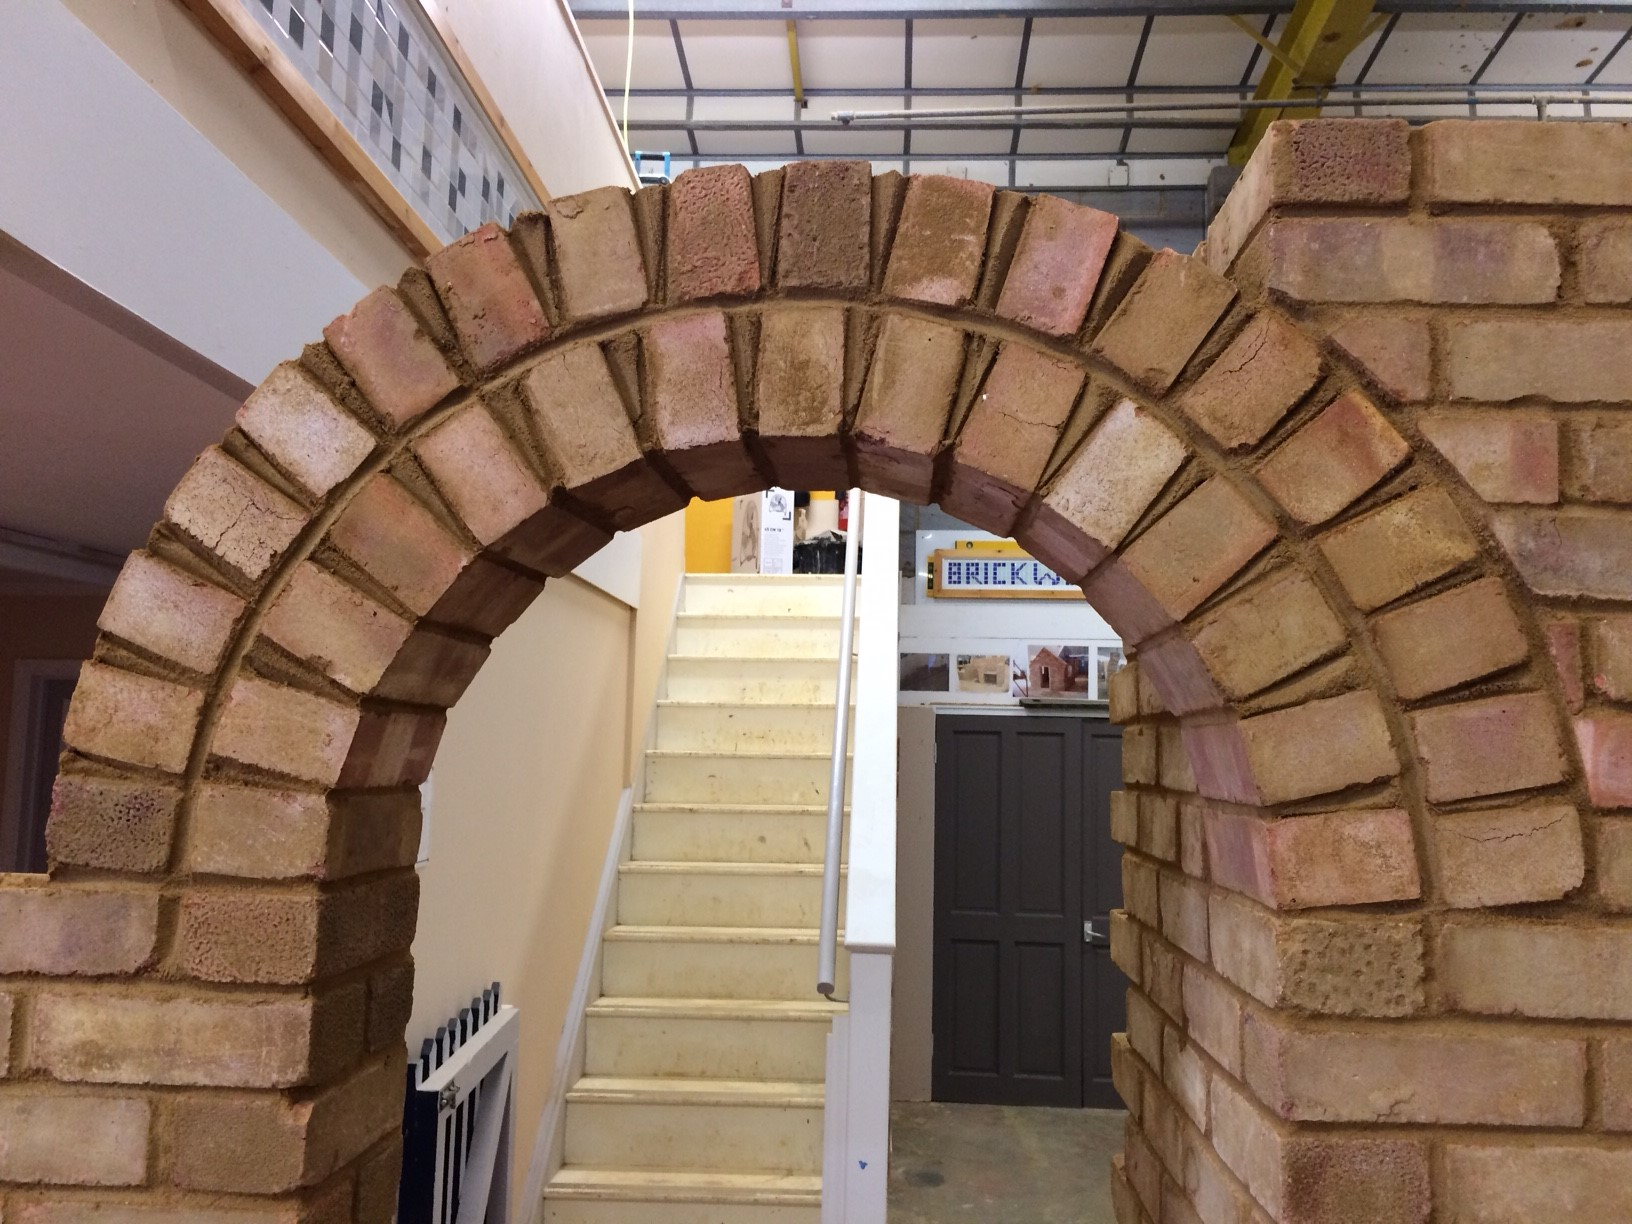 Brick Arch.jpg